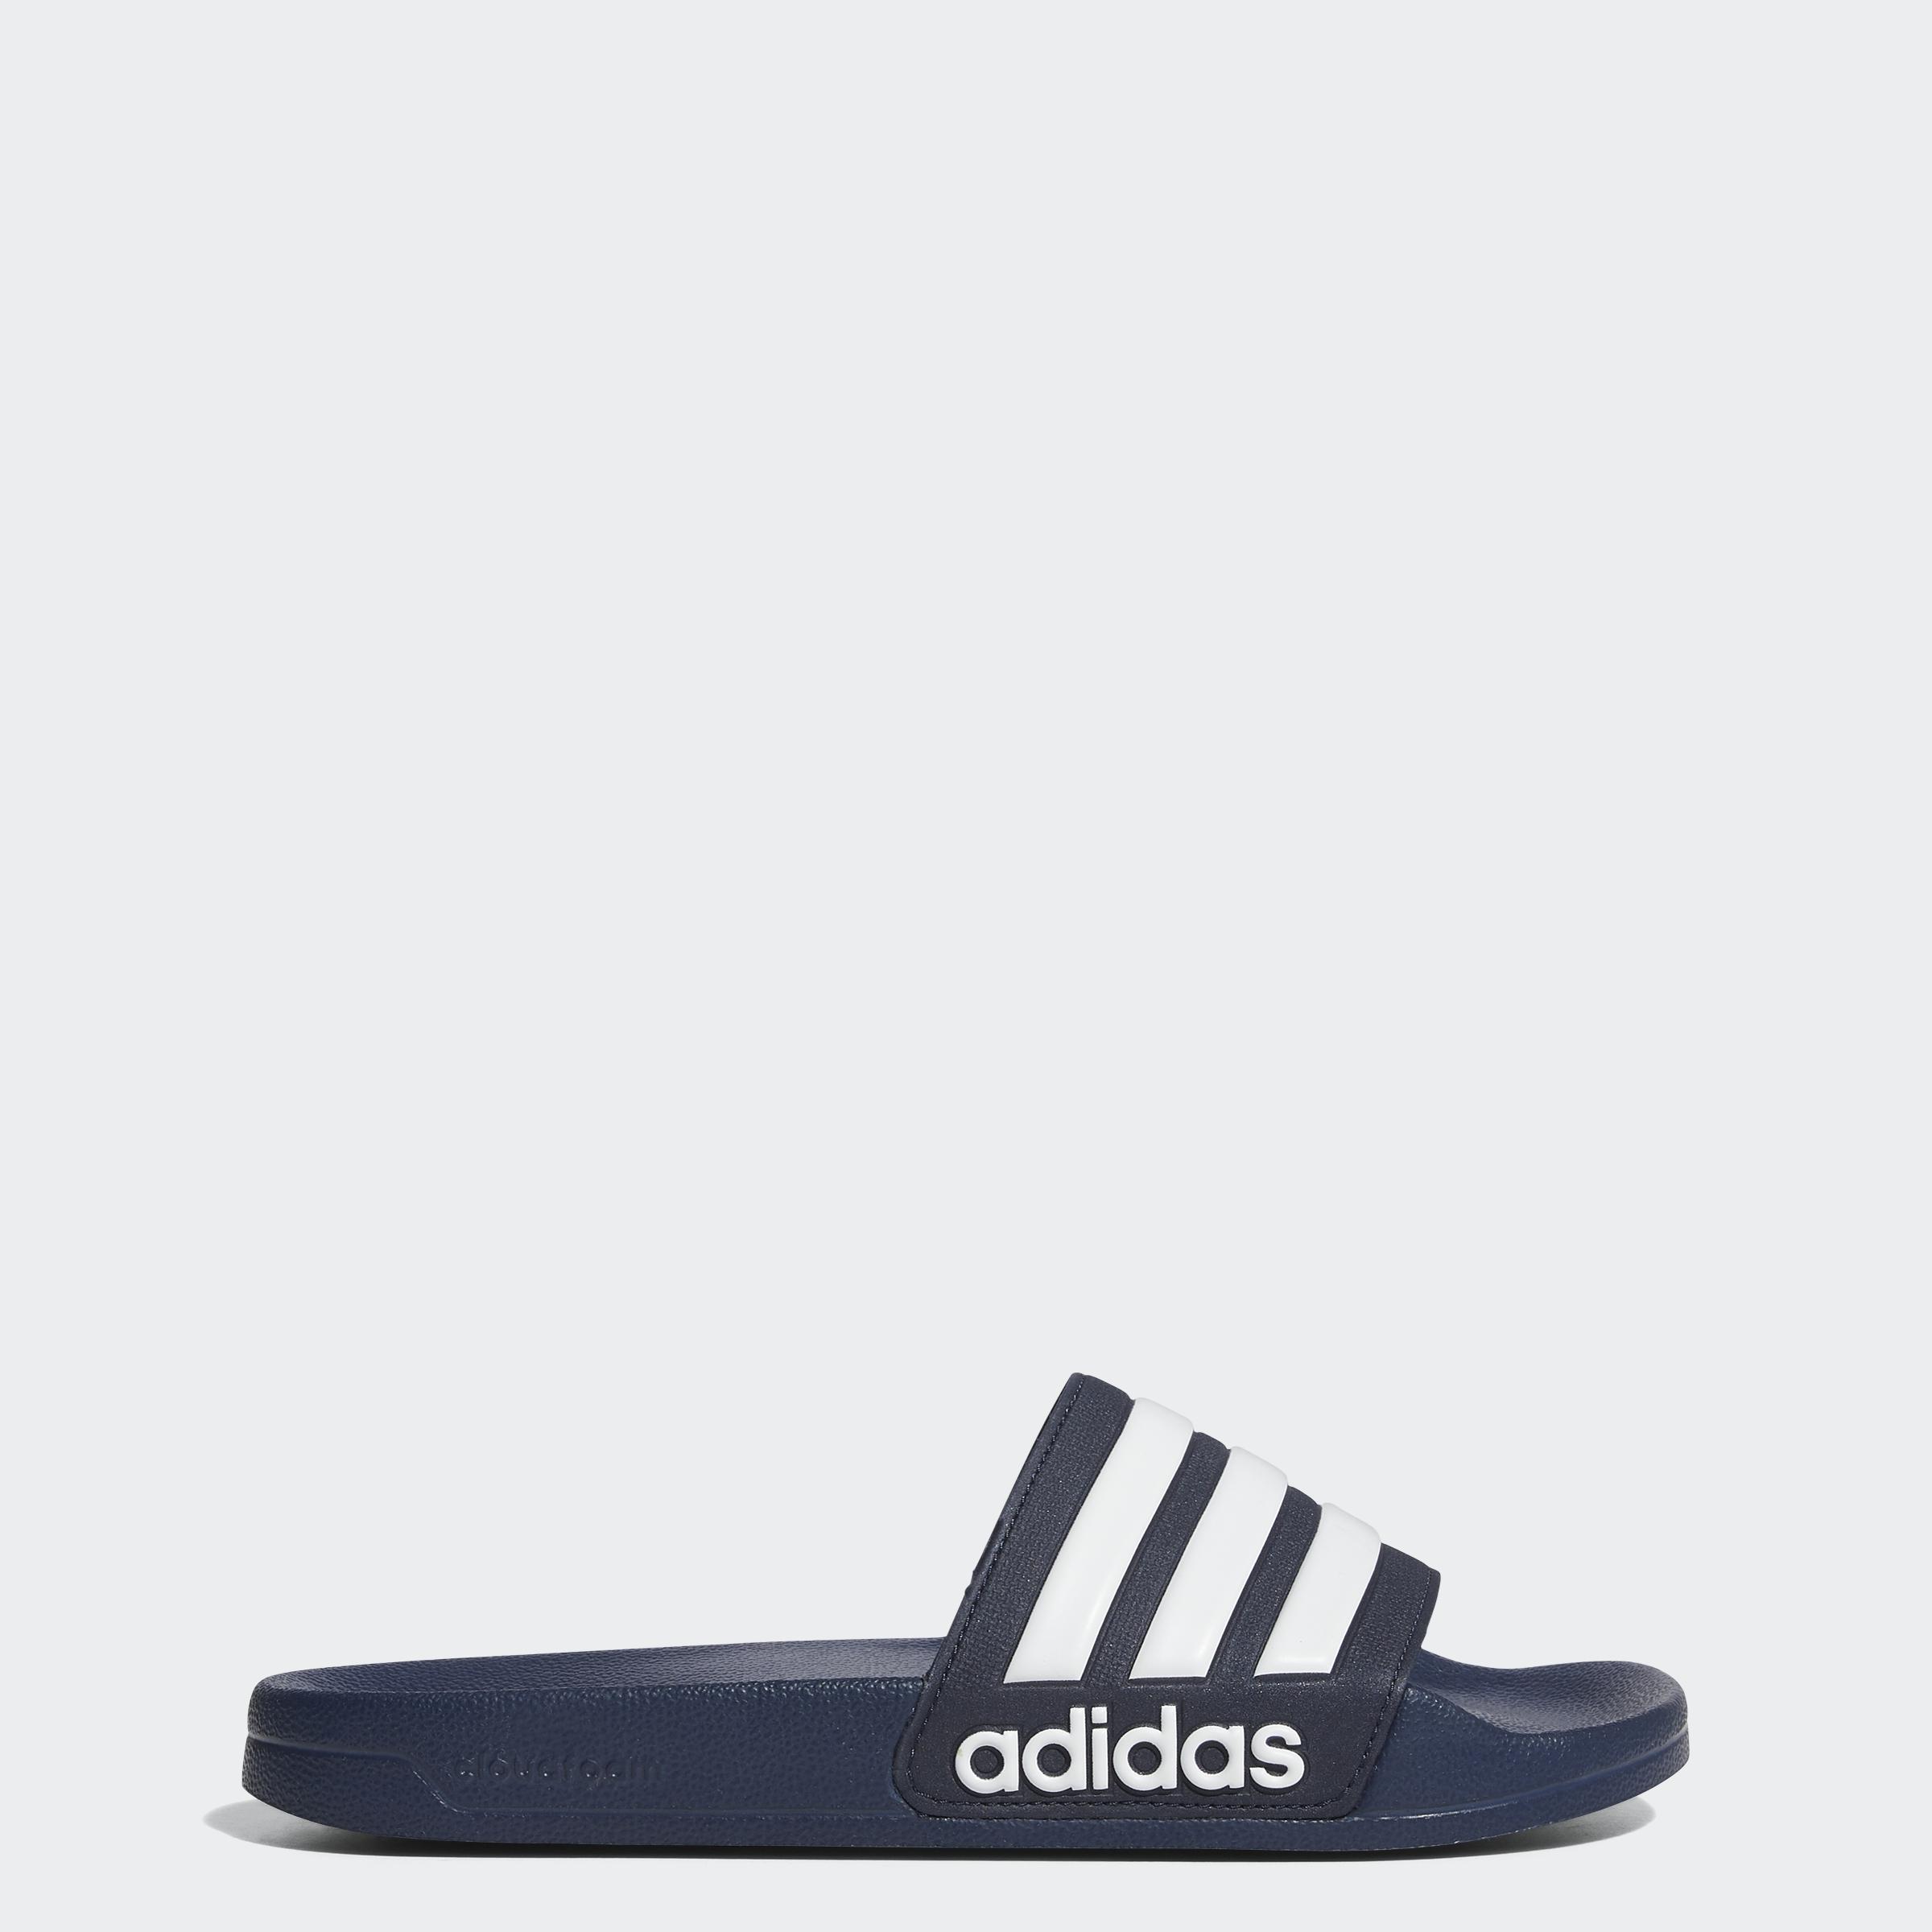 adidas-Adilette-Cloudfoam-Slides-Men-039-s thumbnail 25